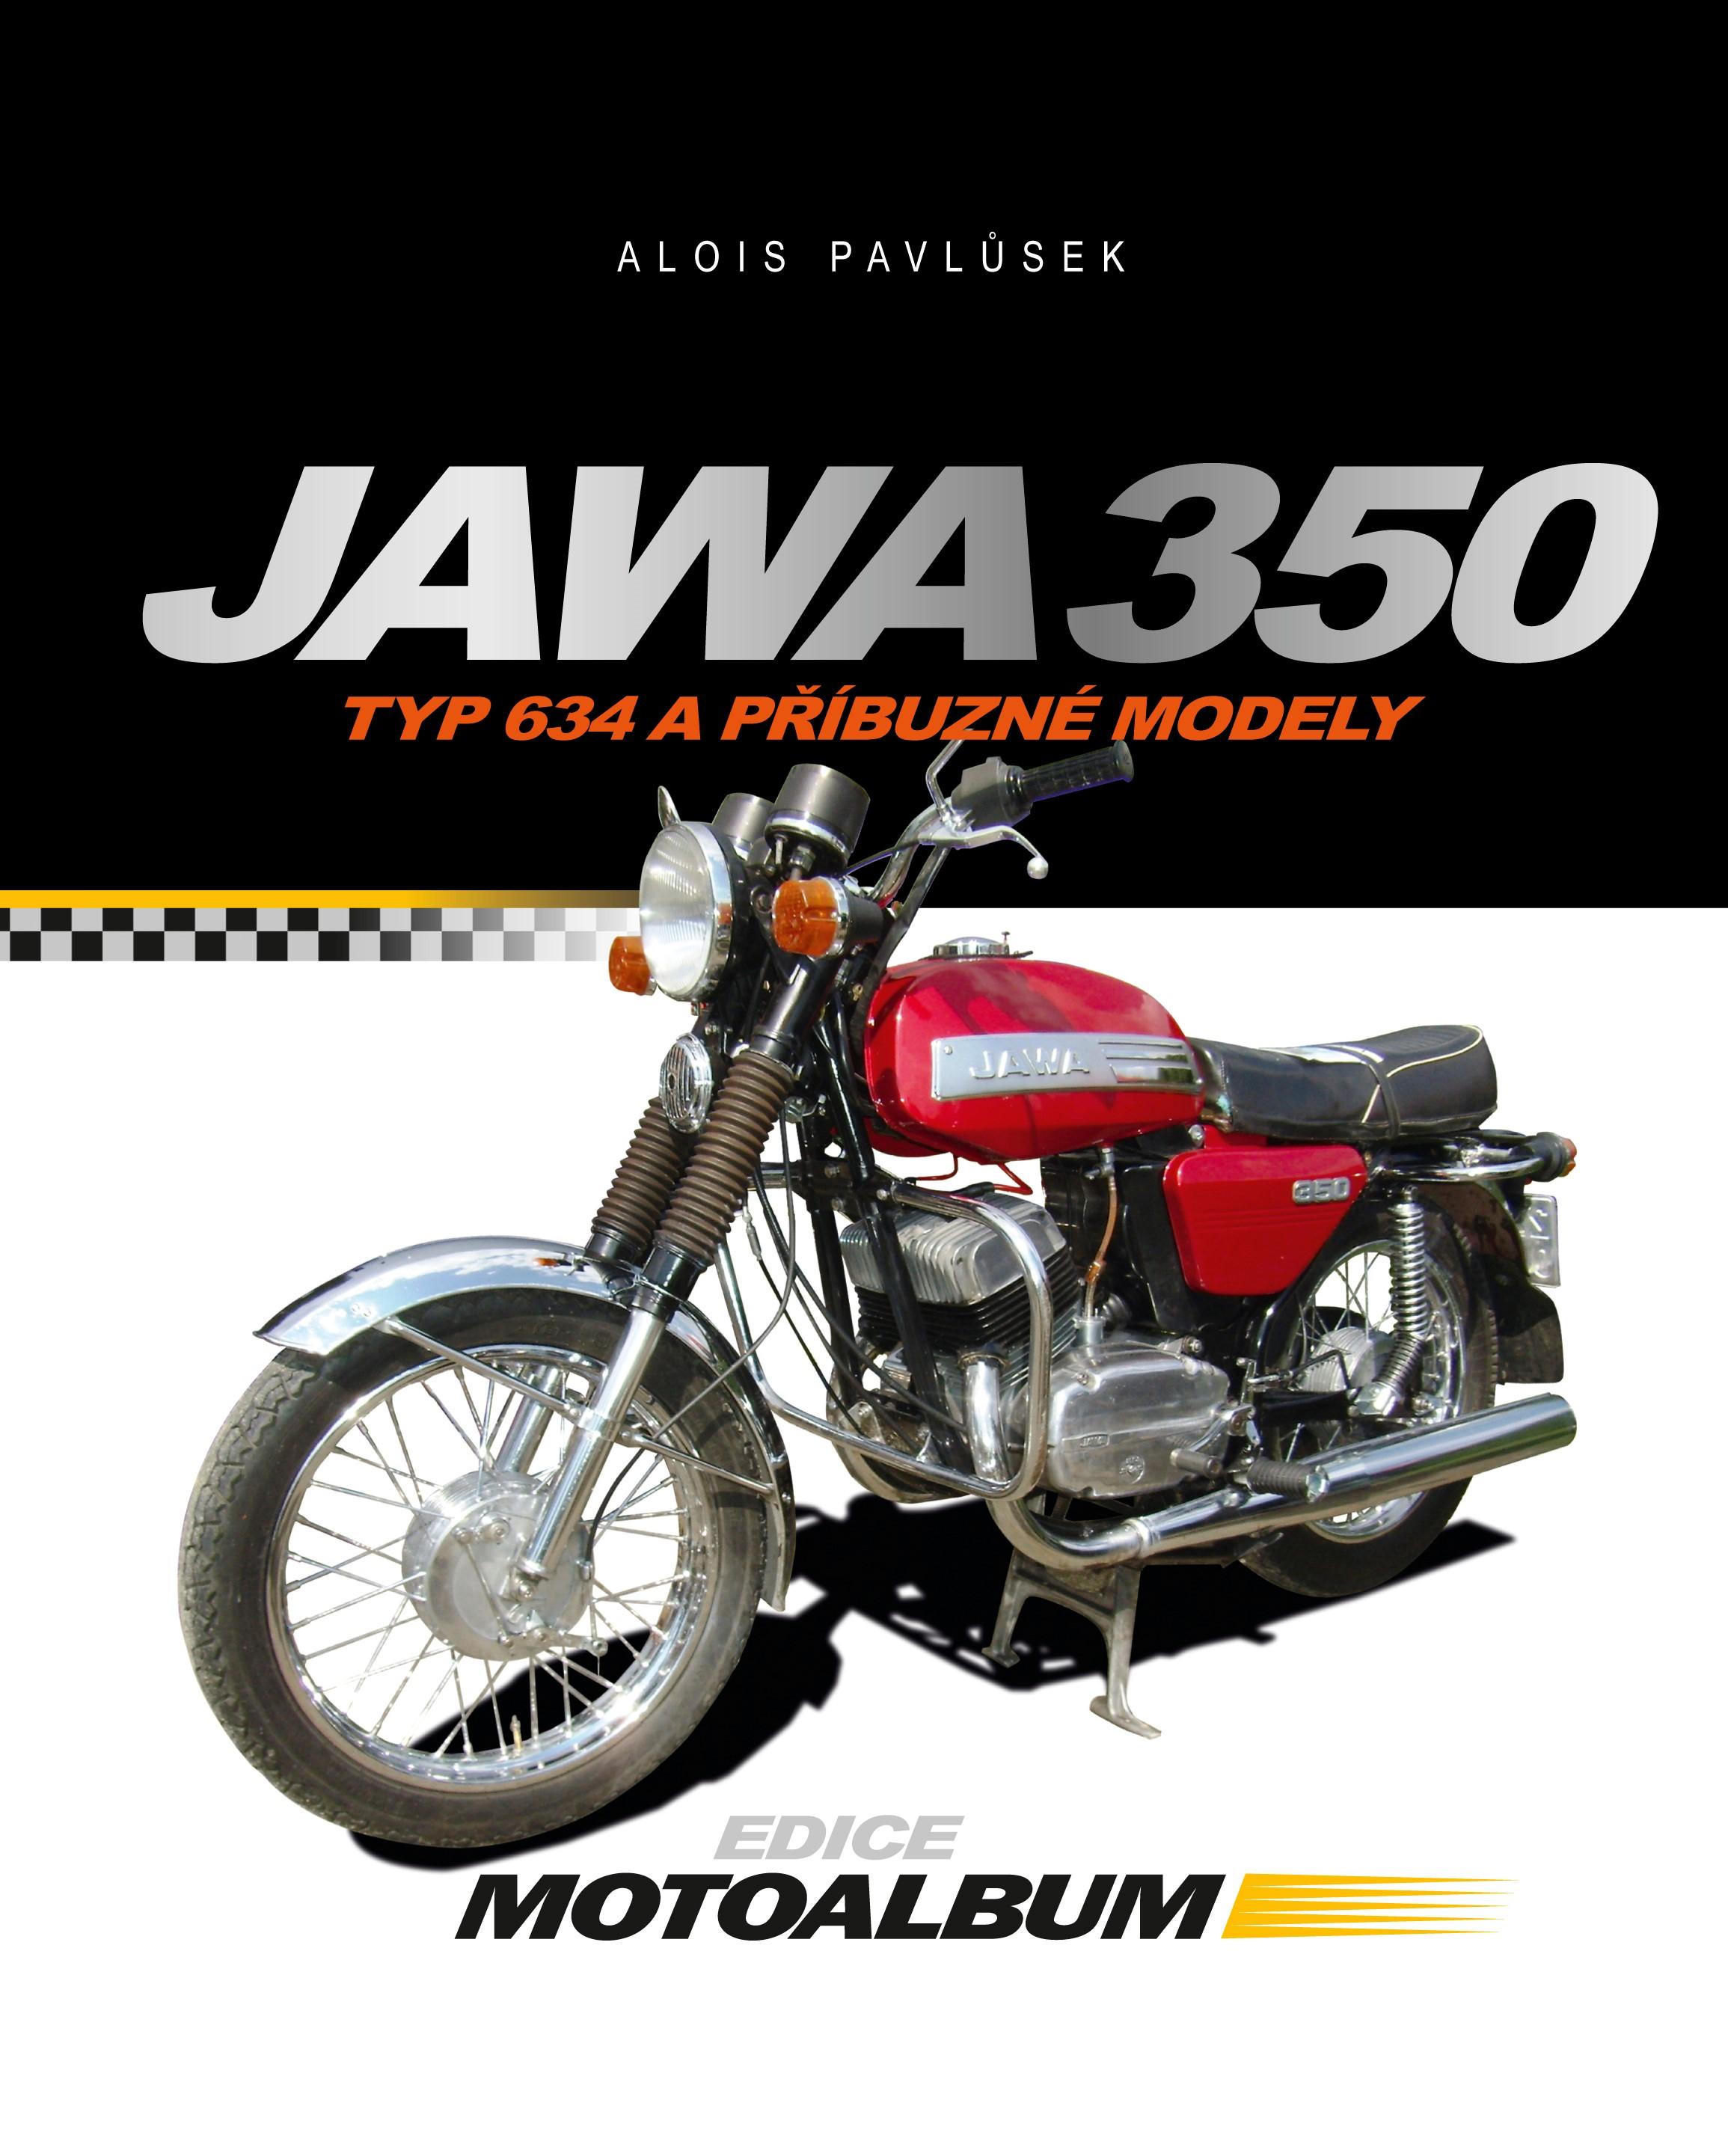 Jawa 350 | Alois Pavlůsek